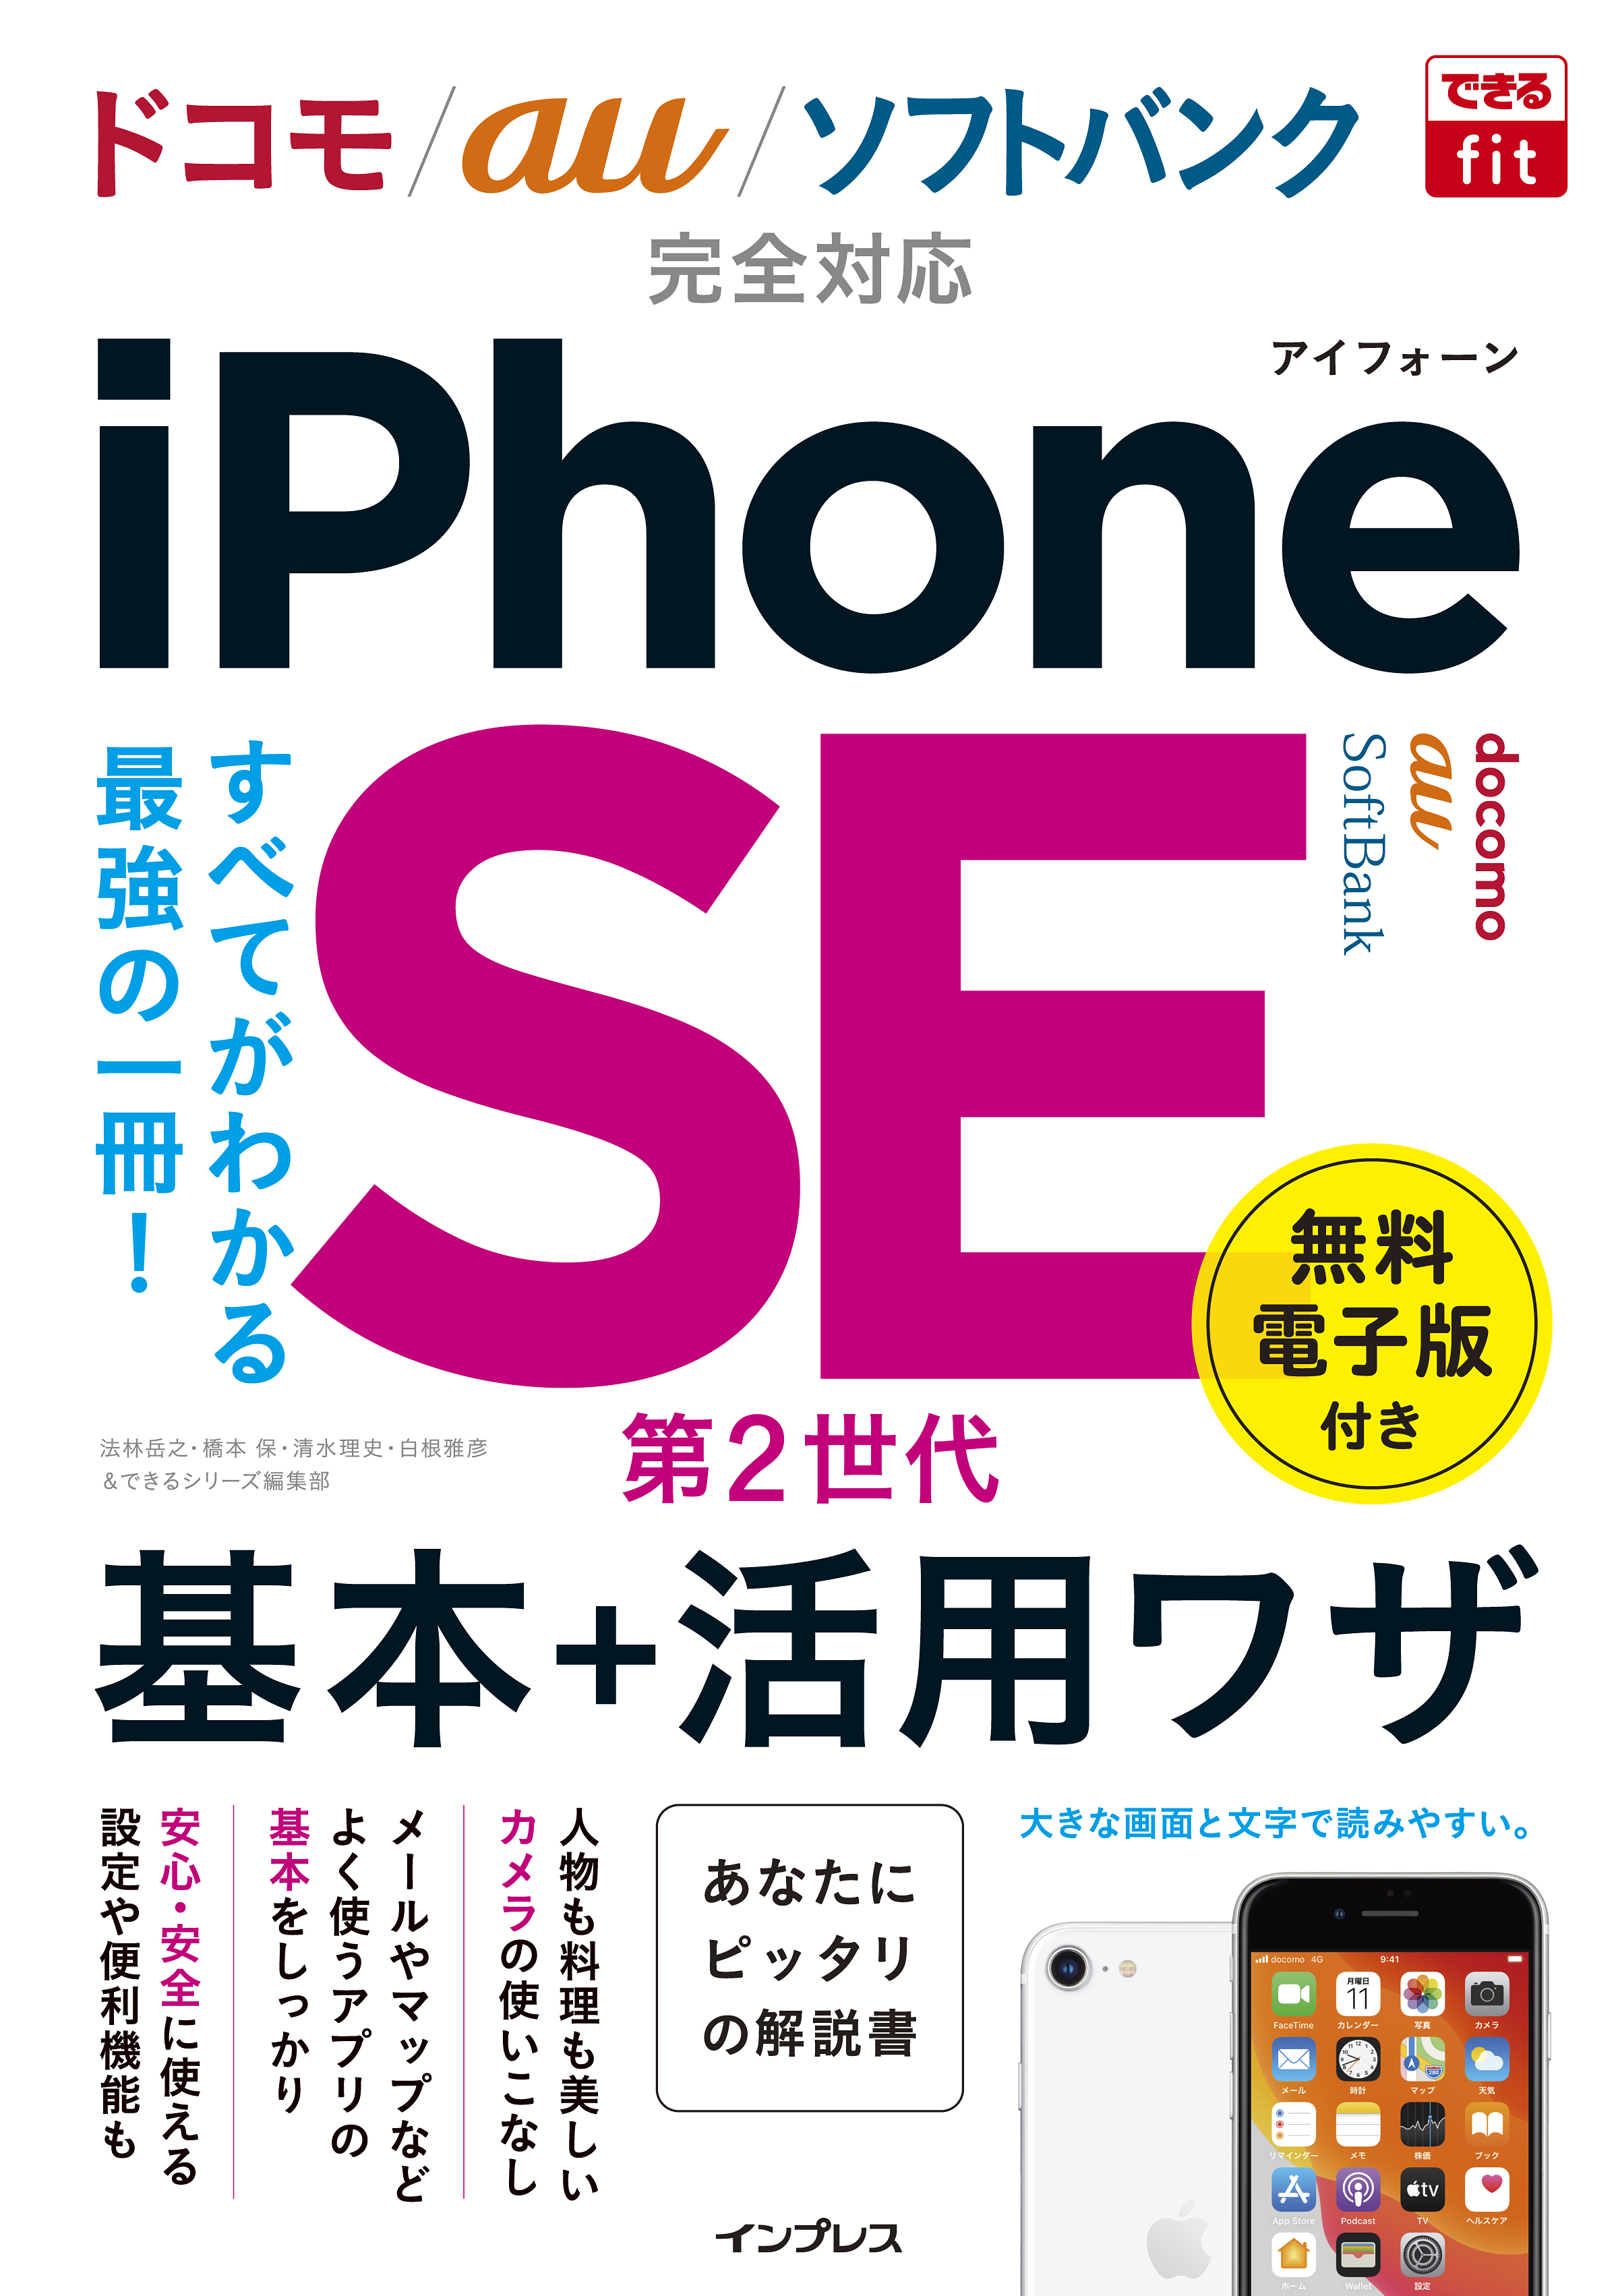 Se ドコモ アイホン ドコモ版iPhoneのSIMロック解除方法 全手順